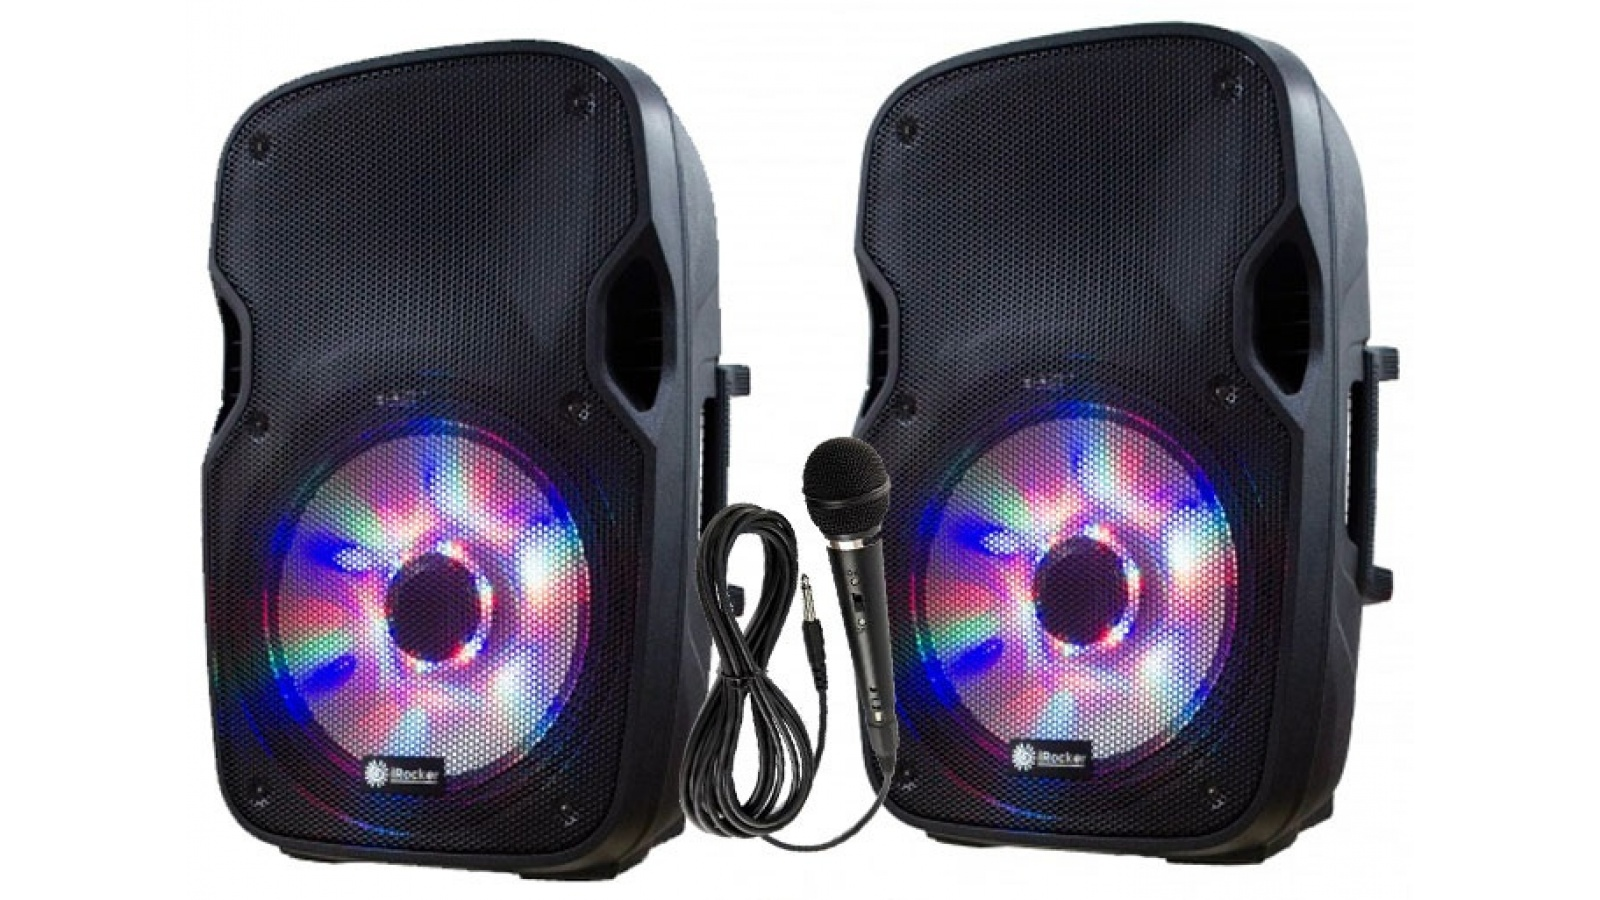 Combo Caja Activa + Caja Pasiva - con lector USB y Bluetooth + Soportes + Microfono - iRocker GCM Pro